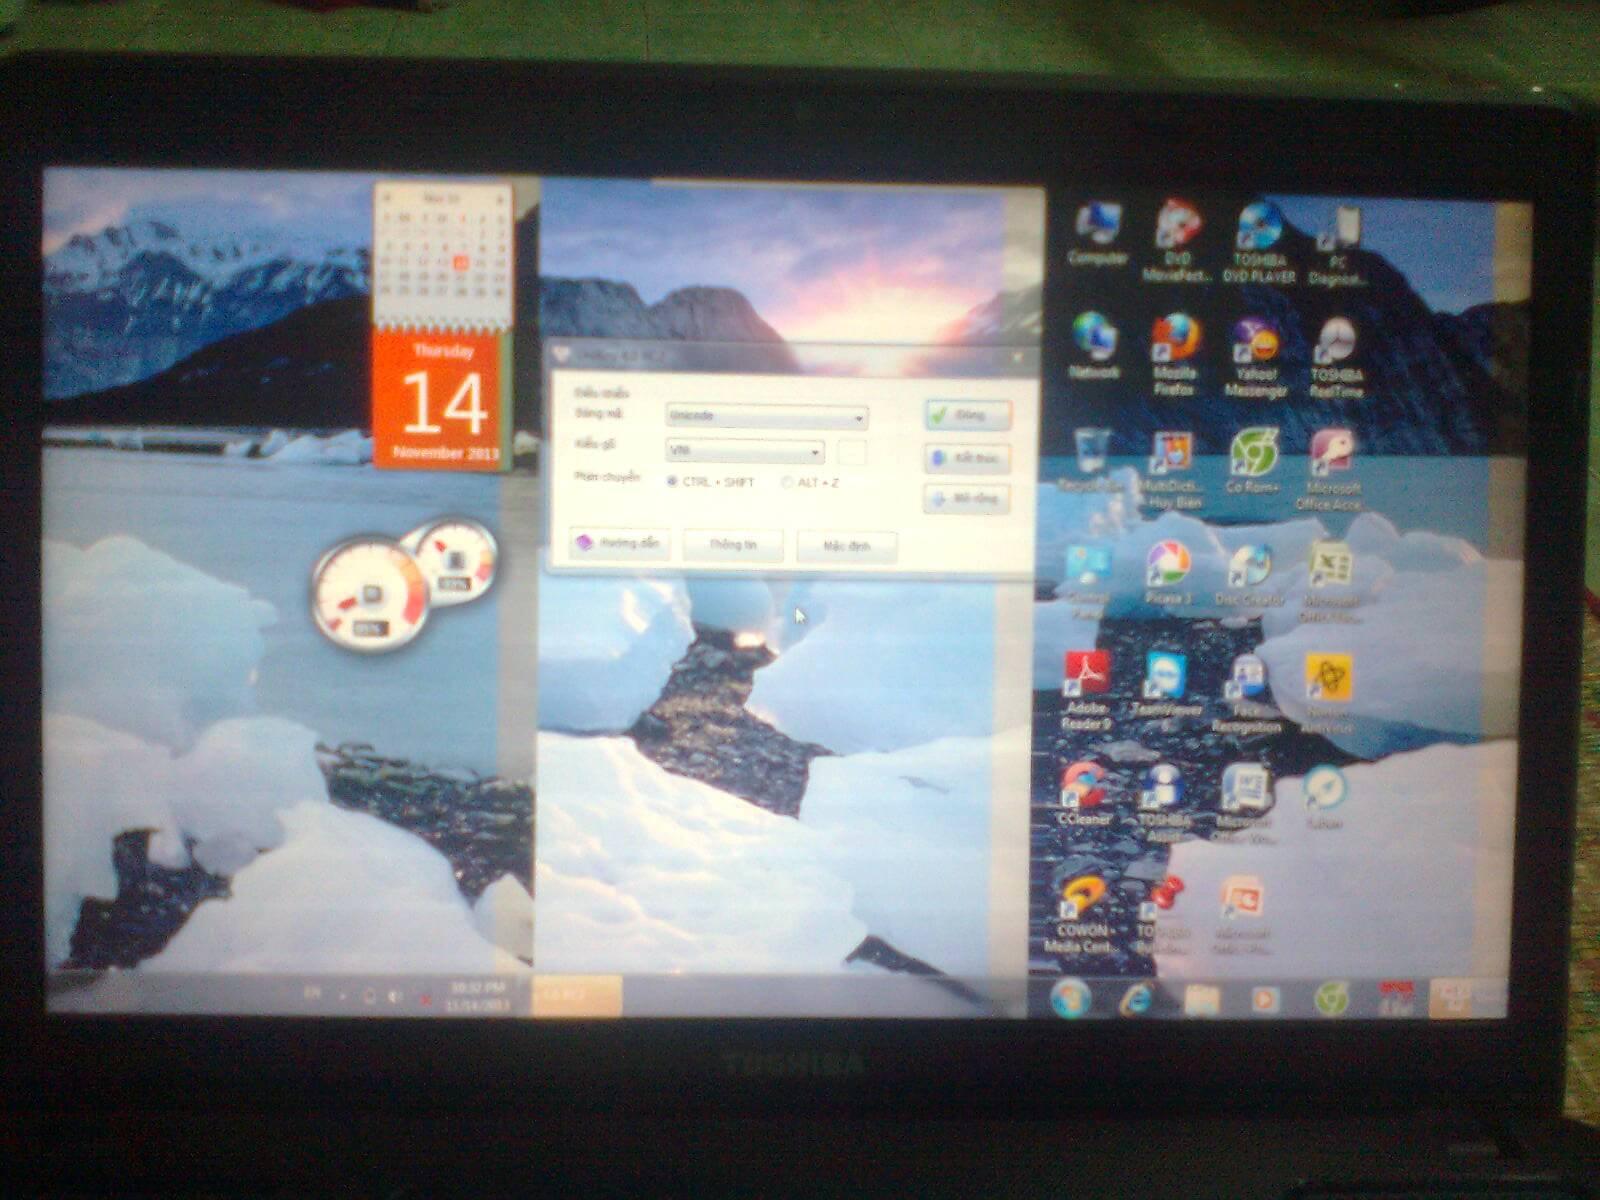 man-hinh-laptop-chia-lam-3-cot